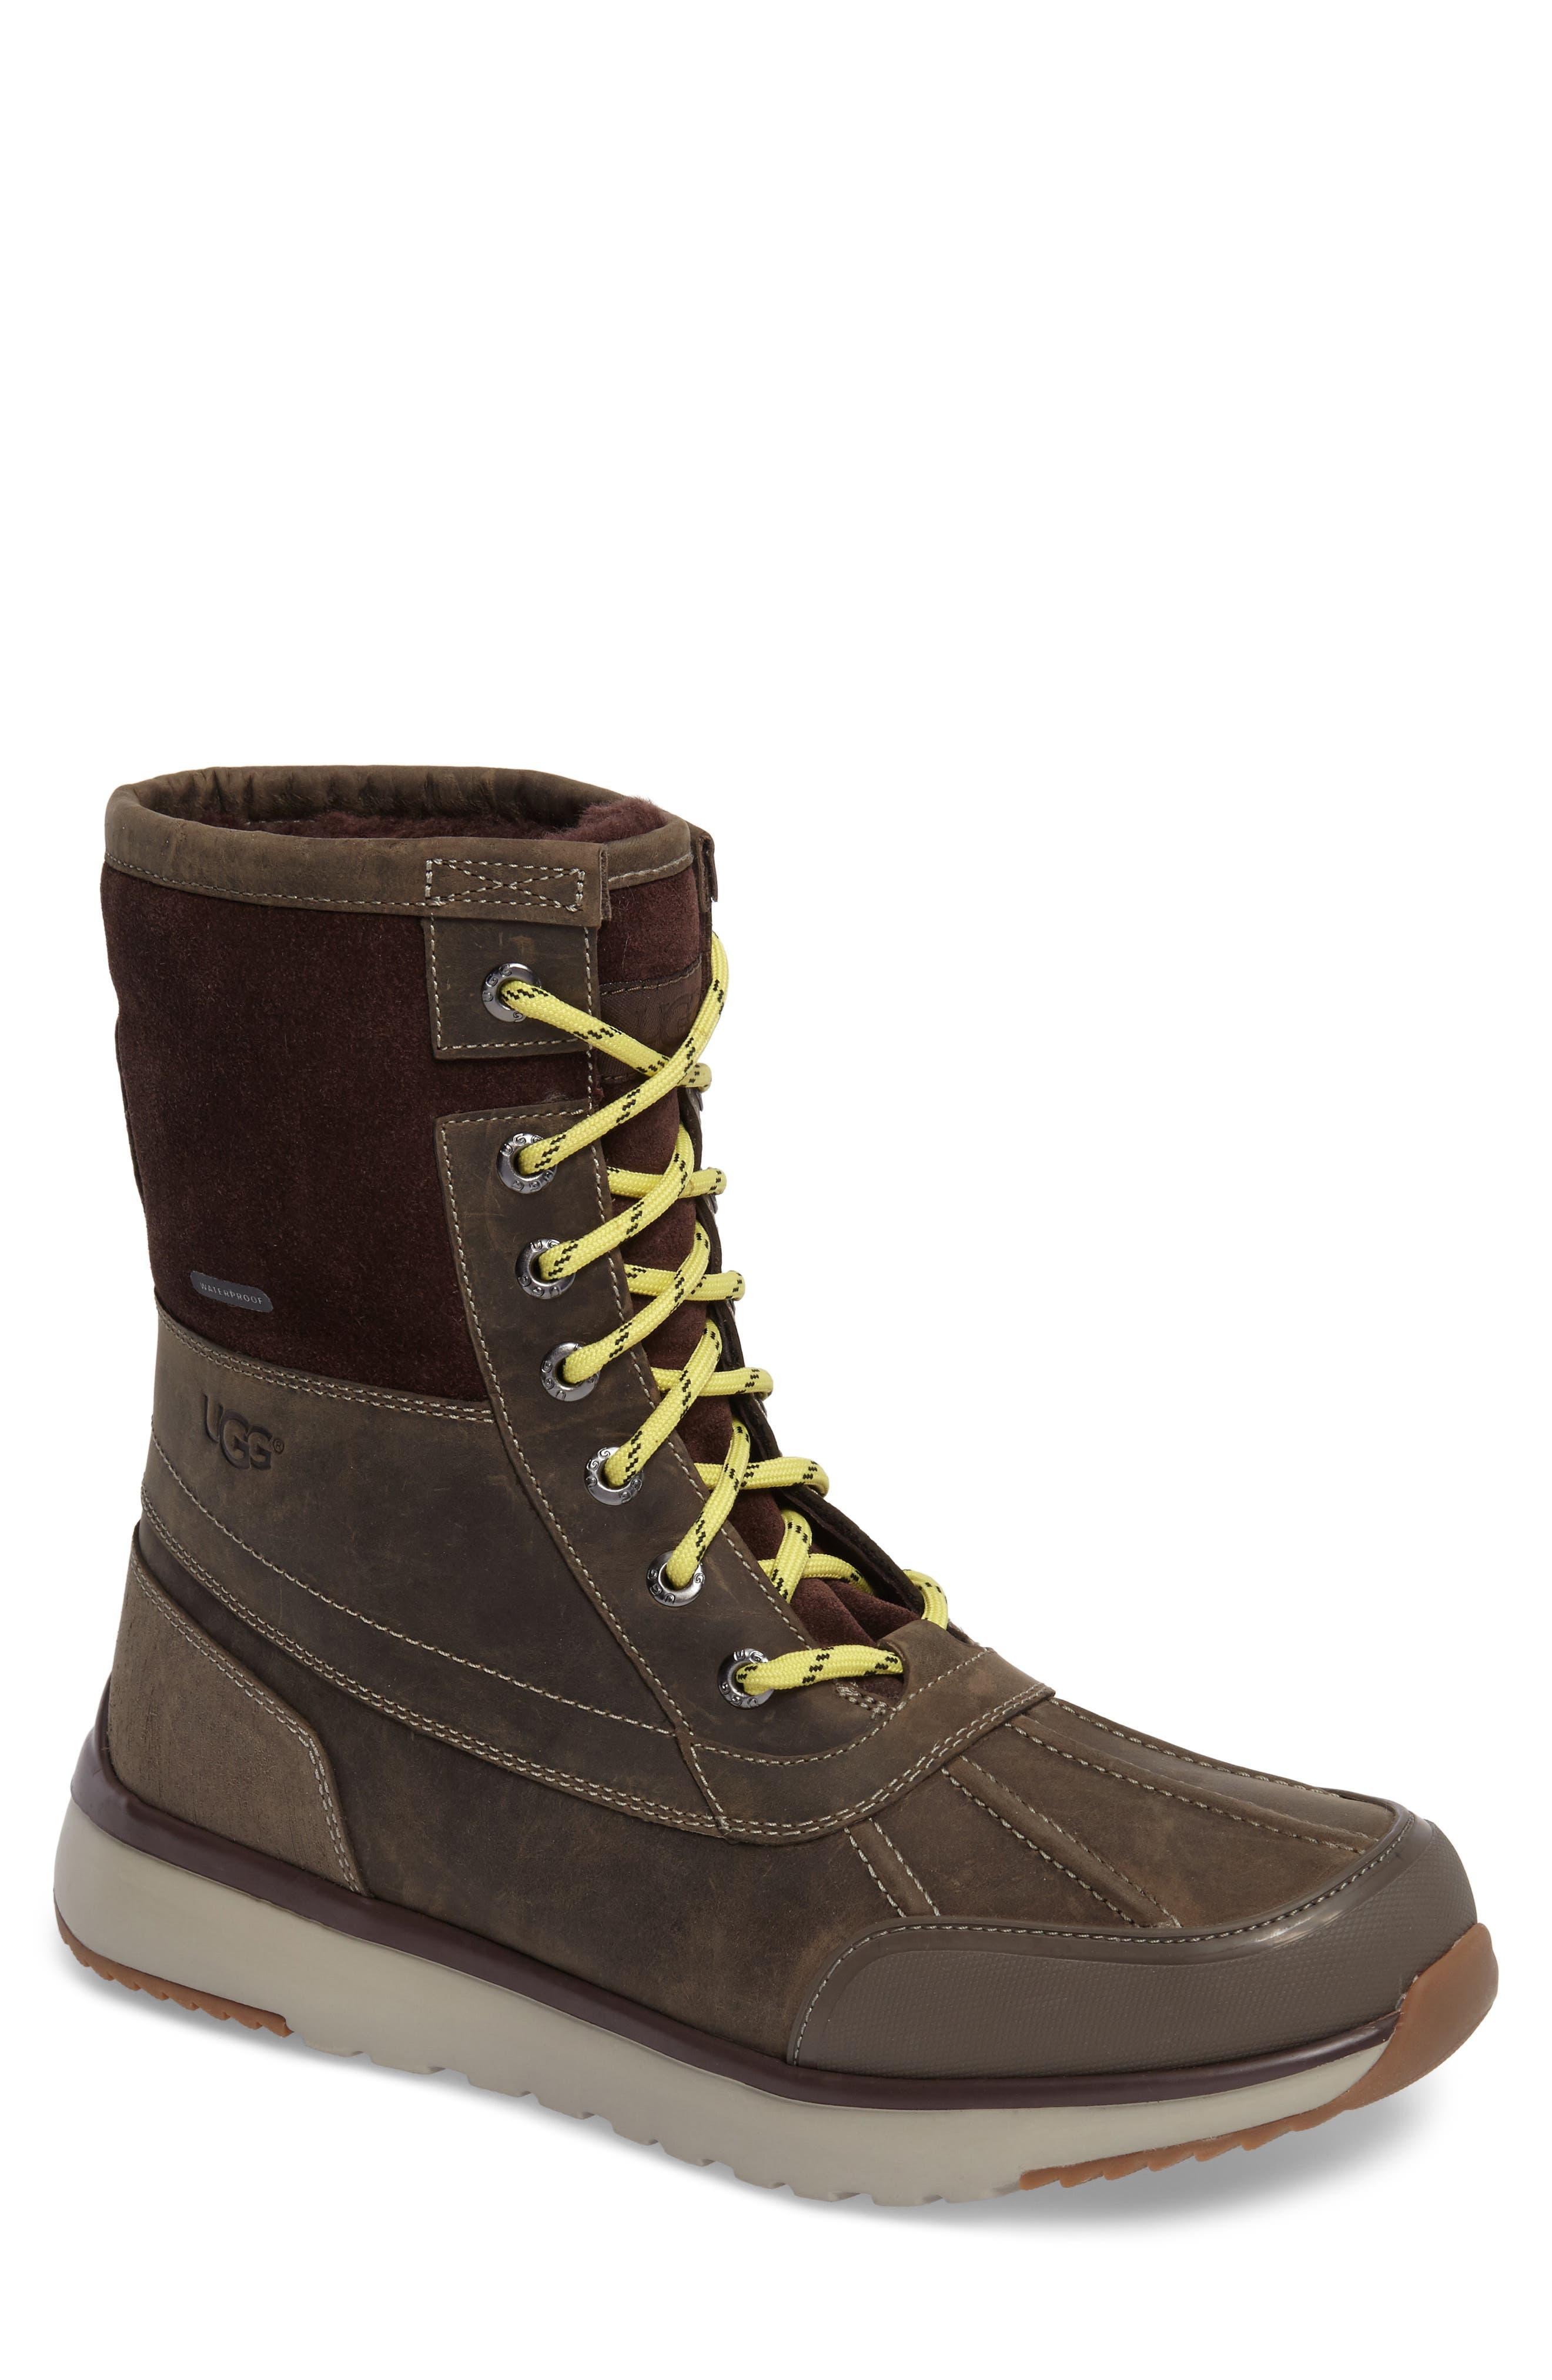 UGG<SUP>®</SUP> Eliasson Waterproof Snow Boot, Main, color, SLATE